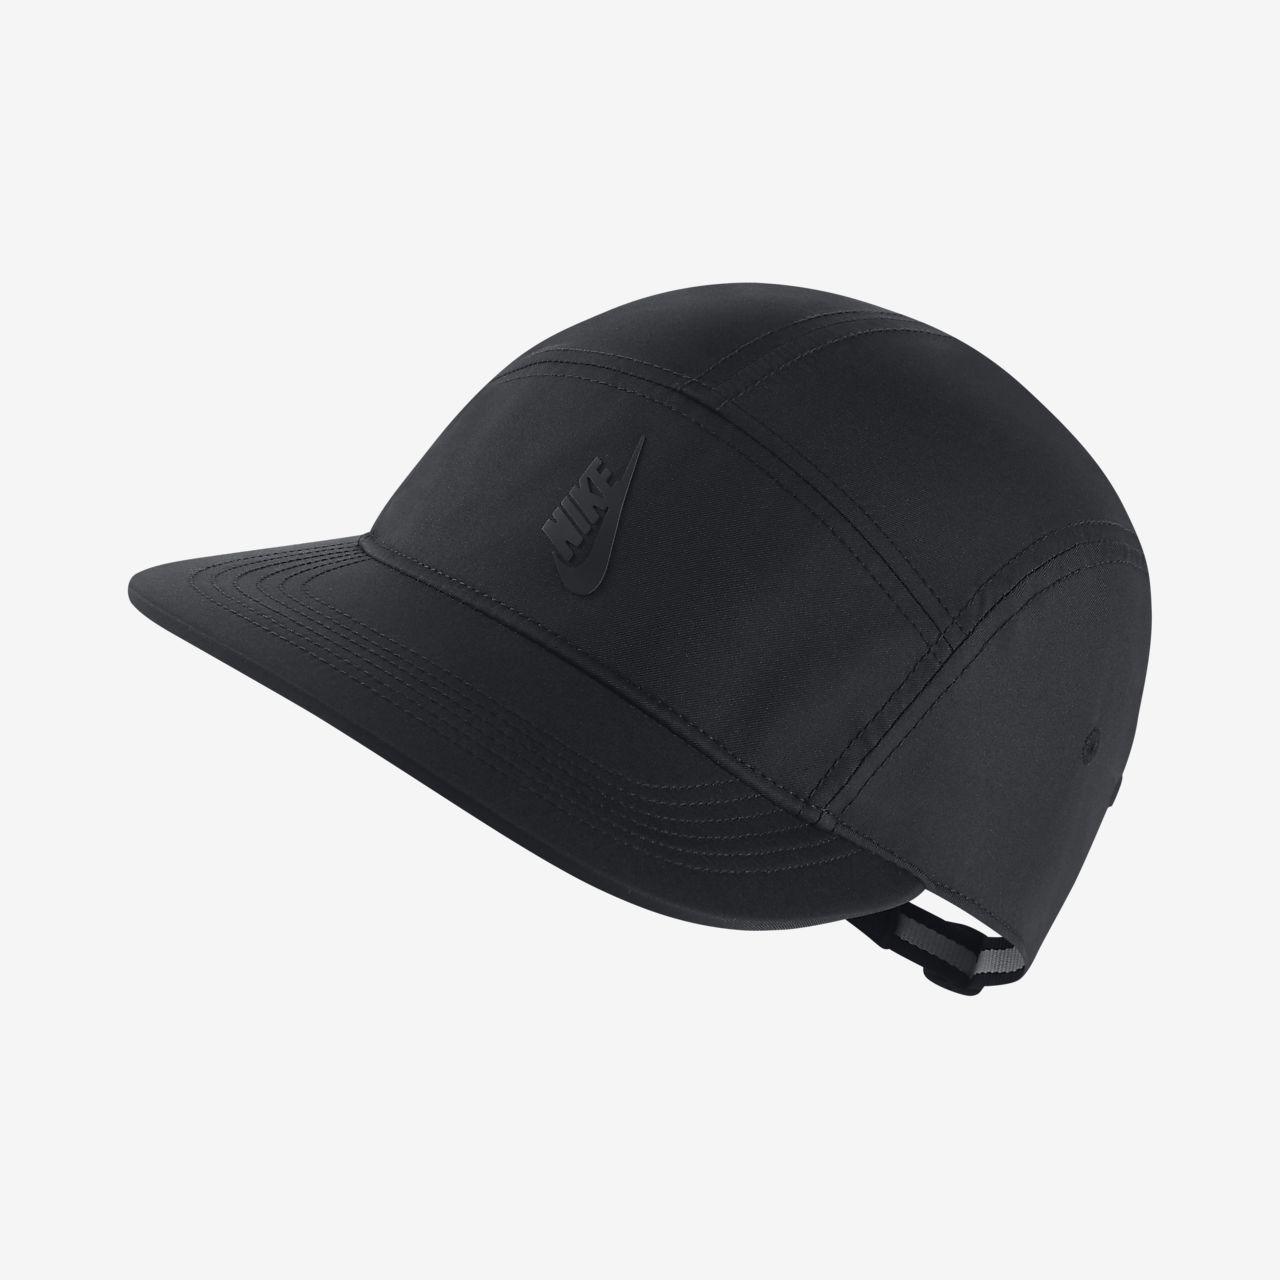 446787faa29 ... running tennis white adjustable strapback hat cap germany nike nrg aw84  adjustable hat 048b5 aaf67 ...